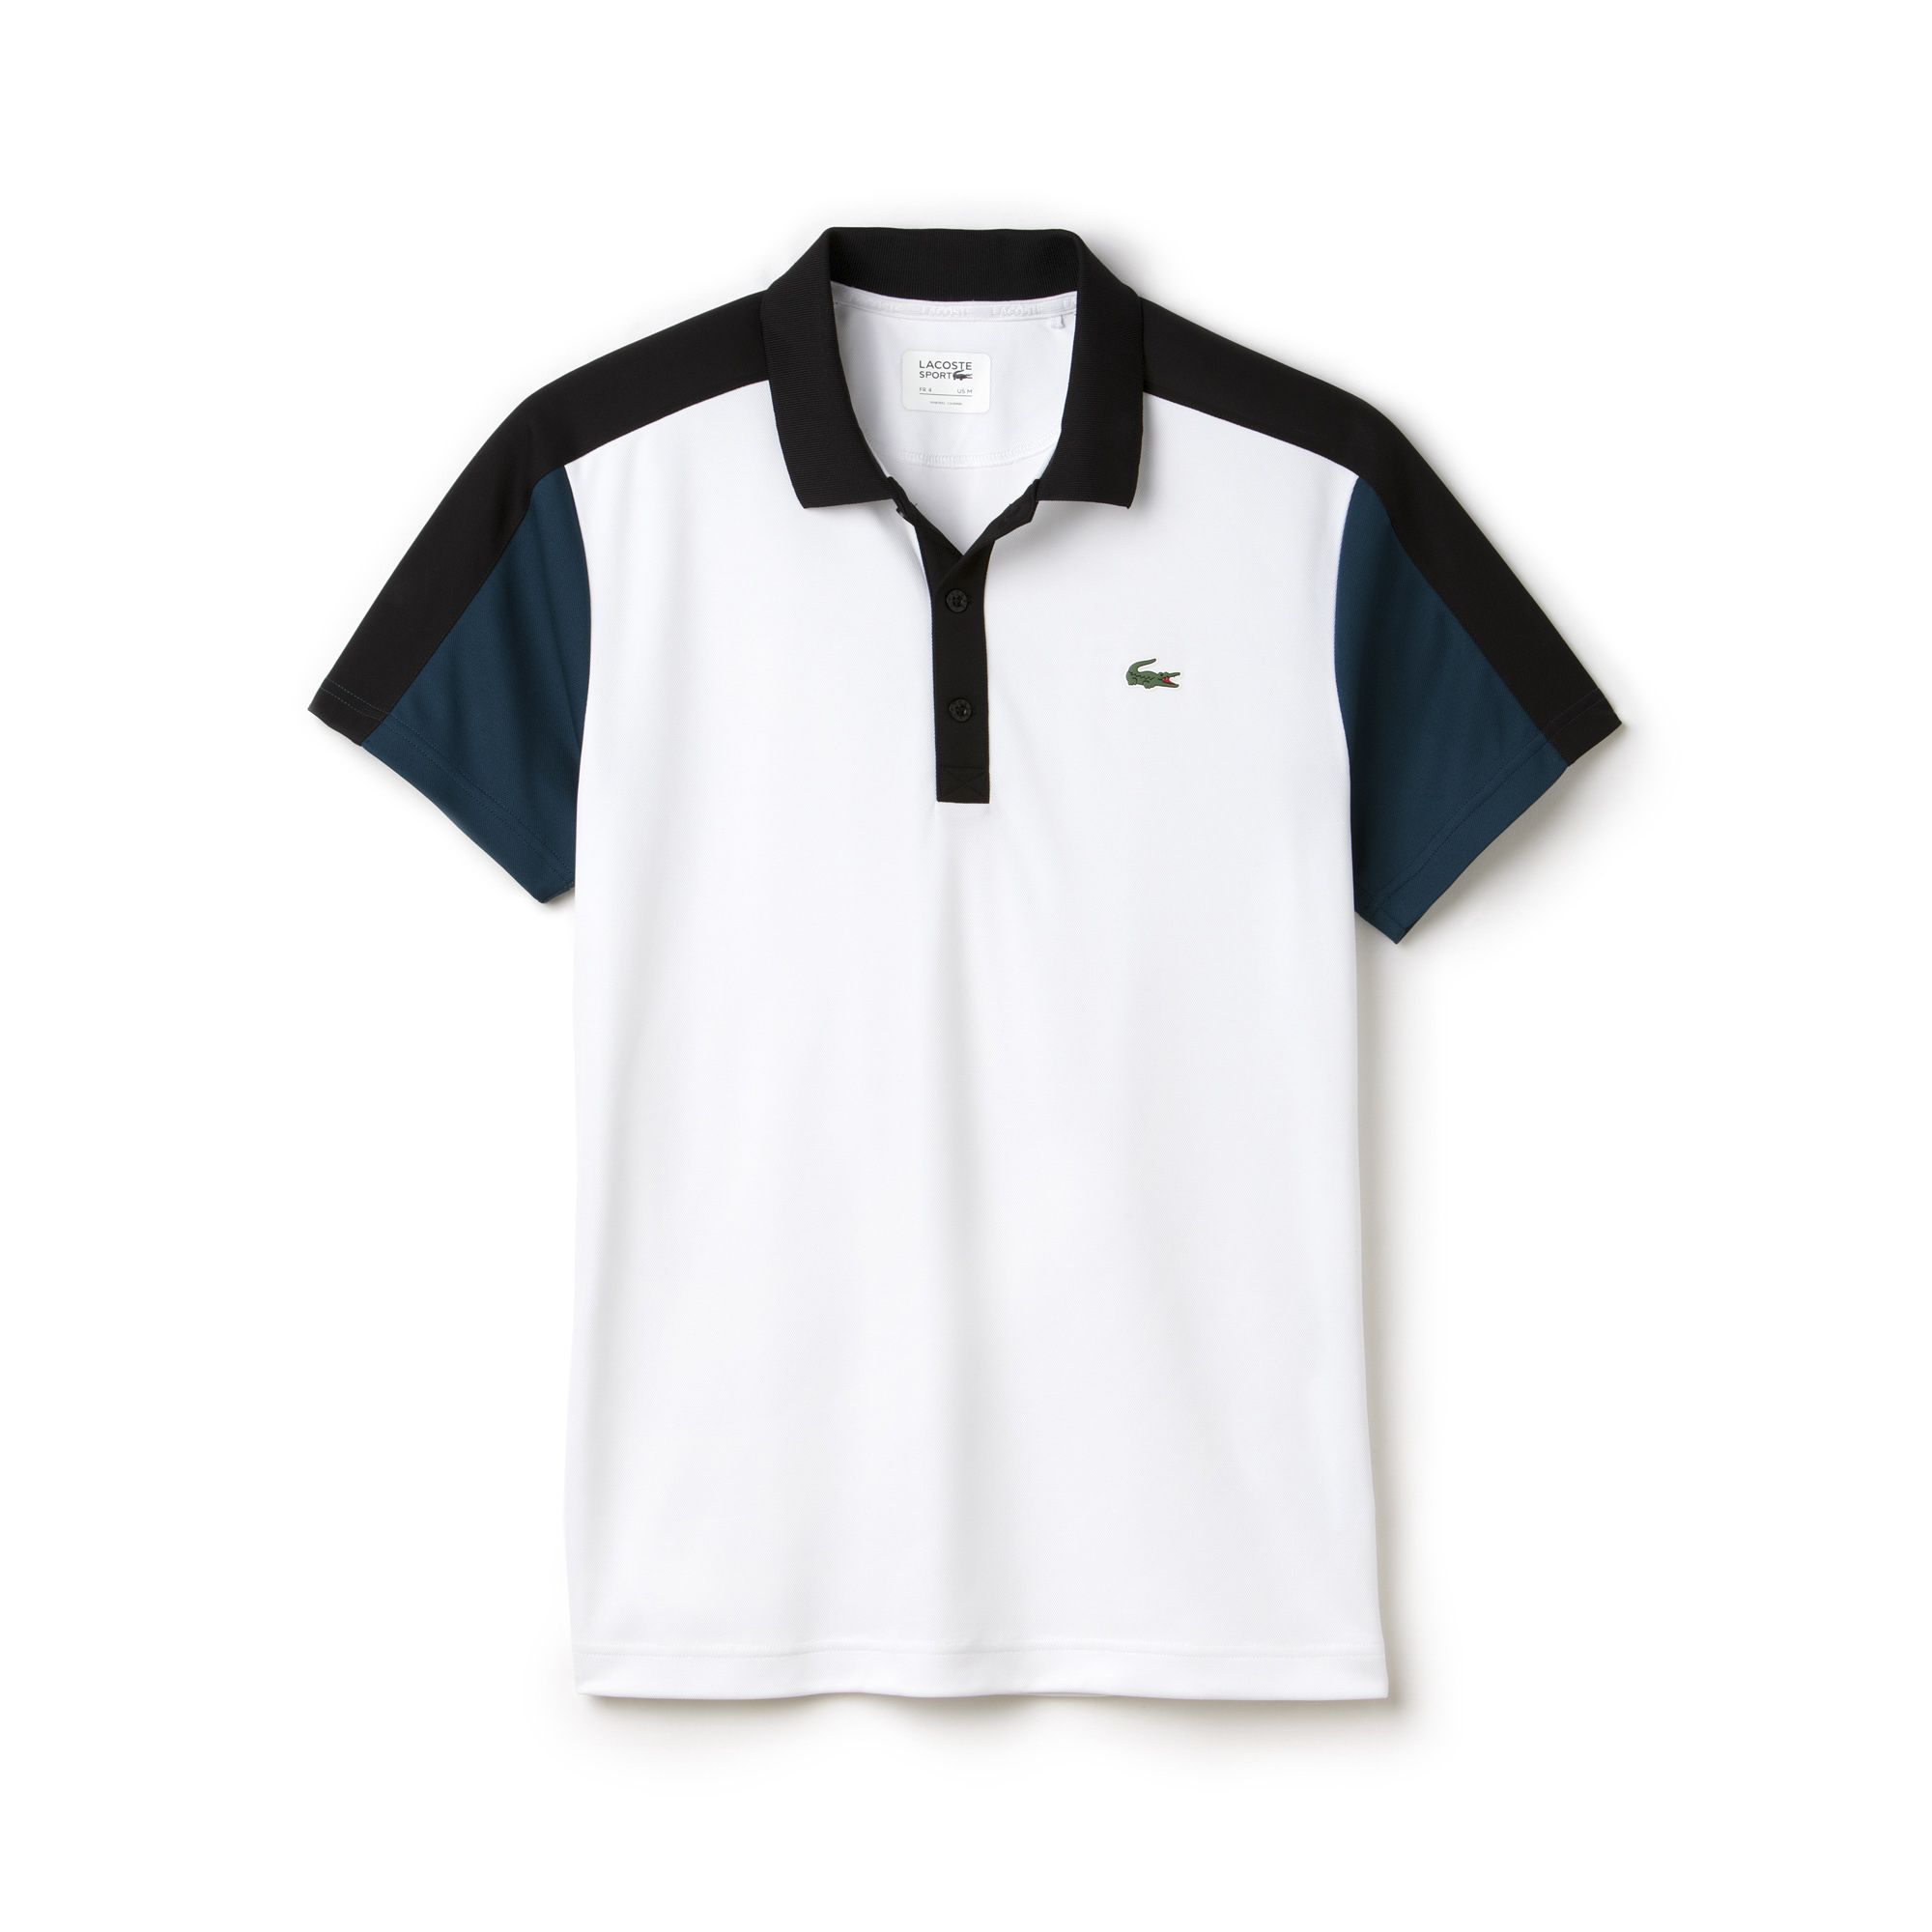 7f88568eb Ultra Dry Colorblock Polo | LACOSTE | TOPS | Polo, Lacoste polo ...